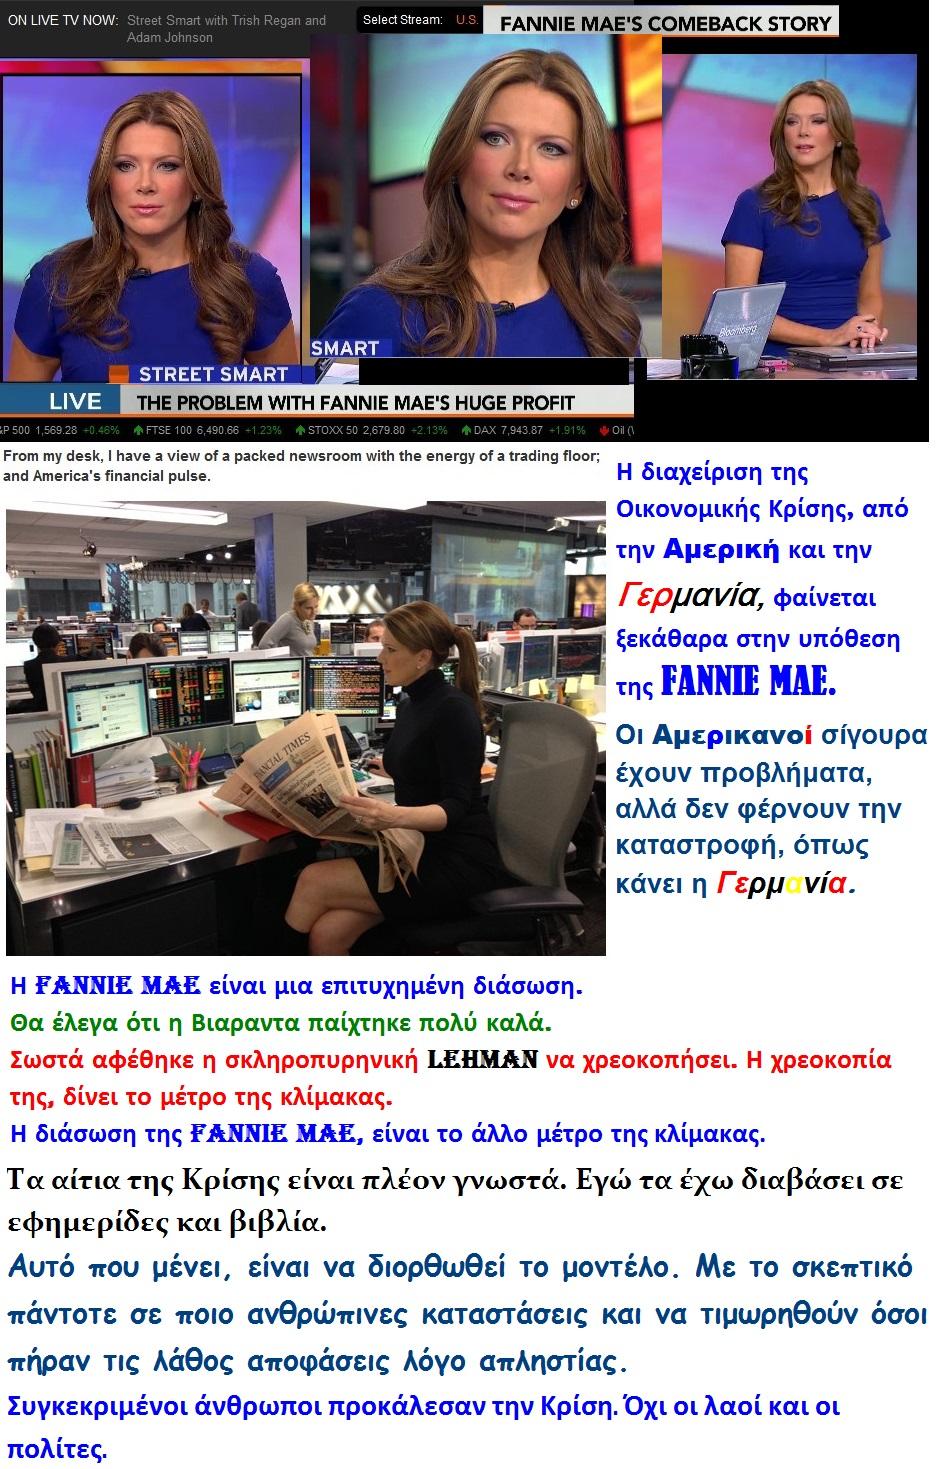 FANNIE MAE COMEBACK